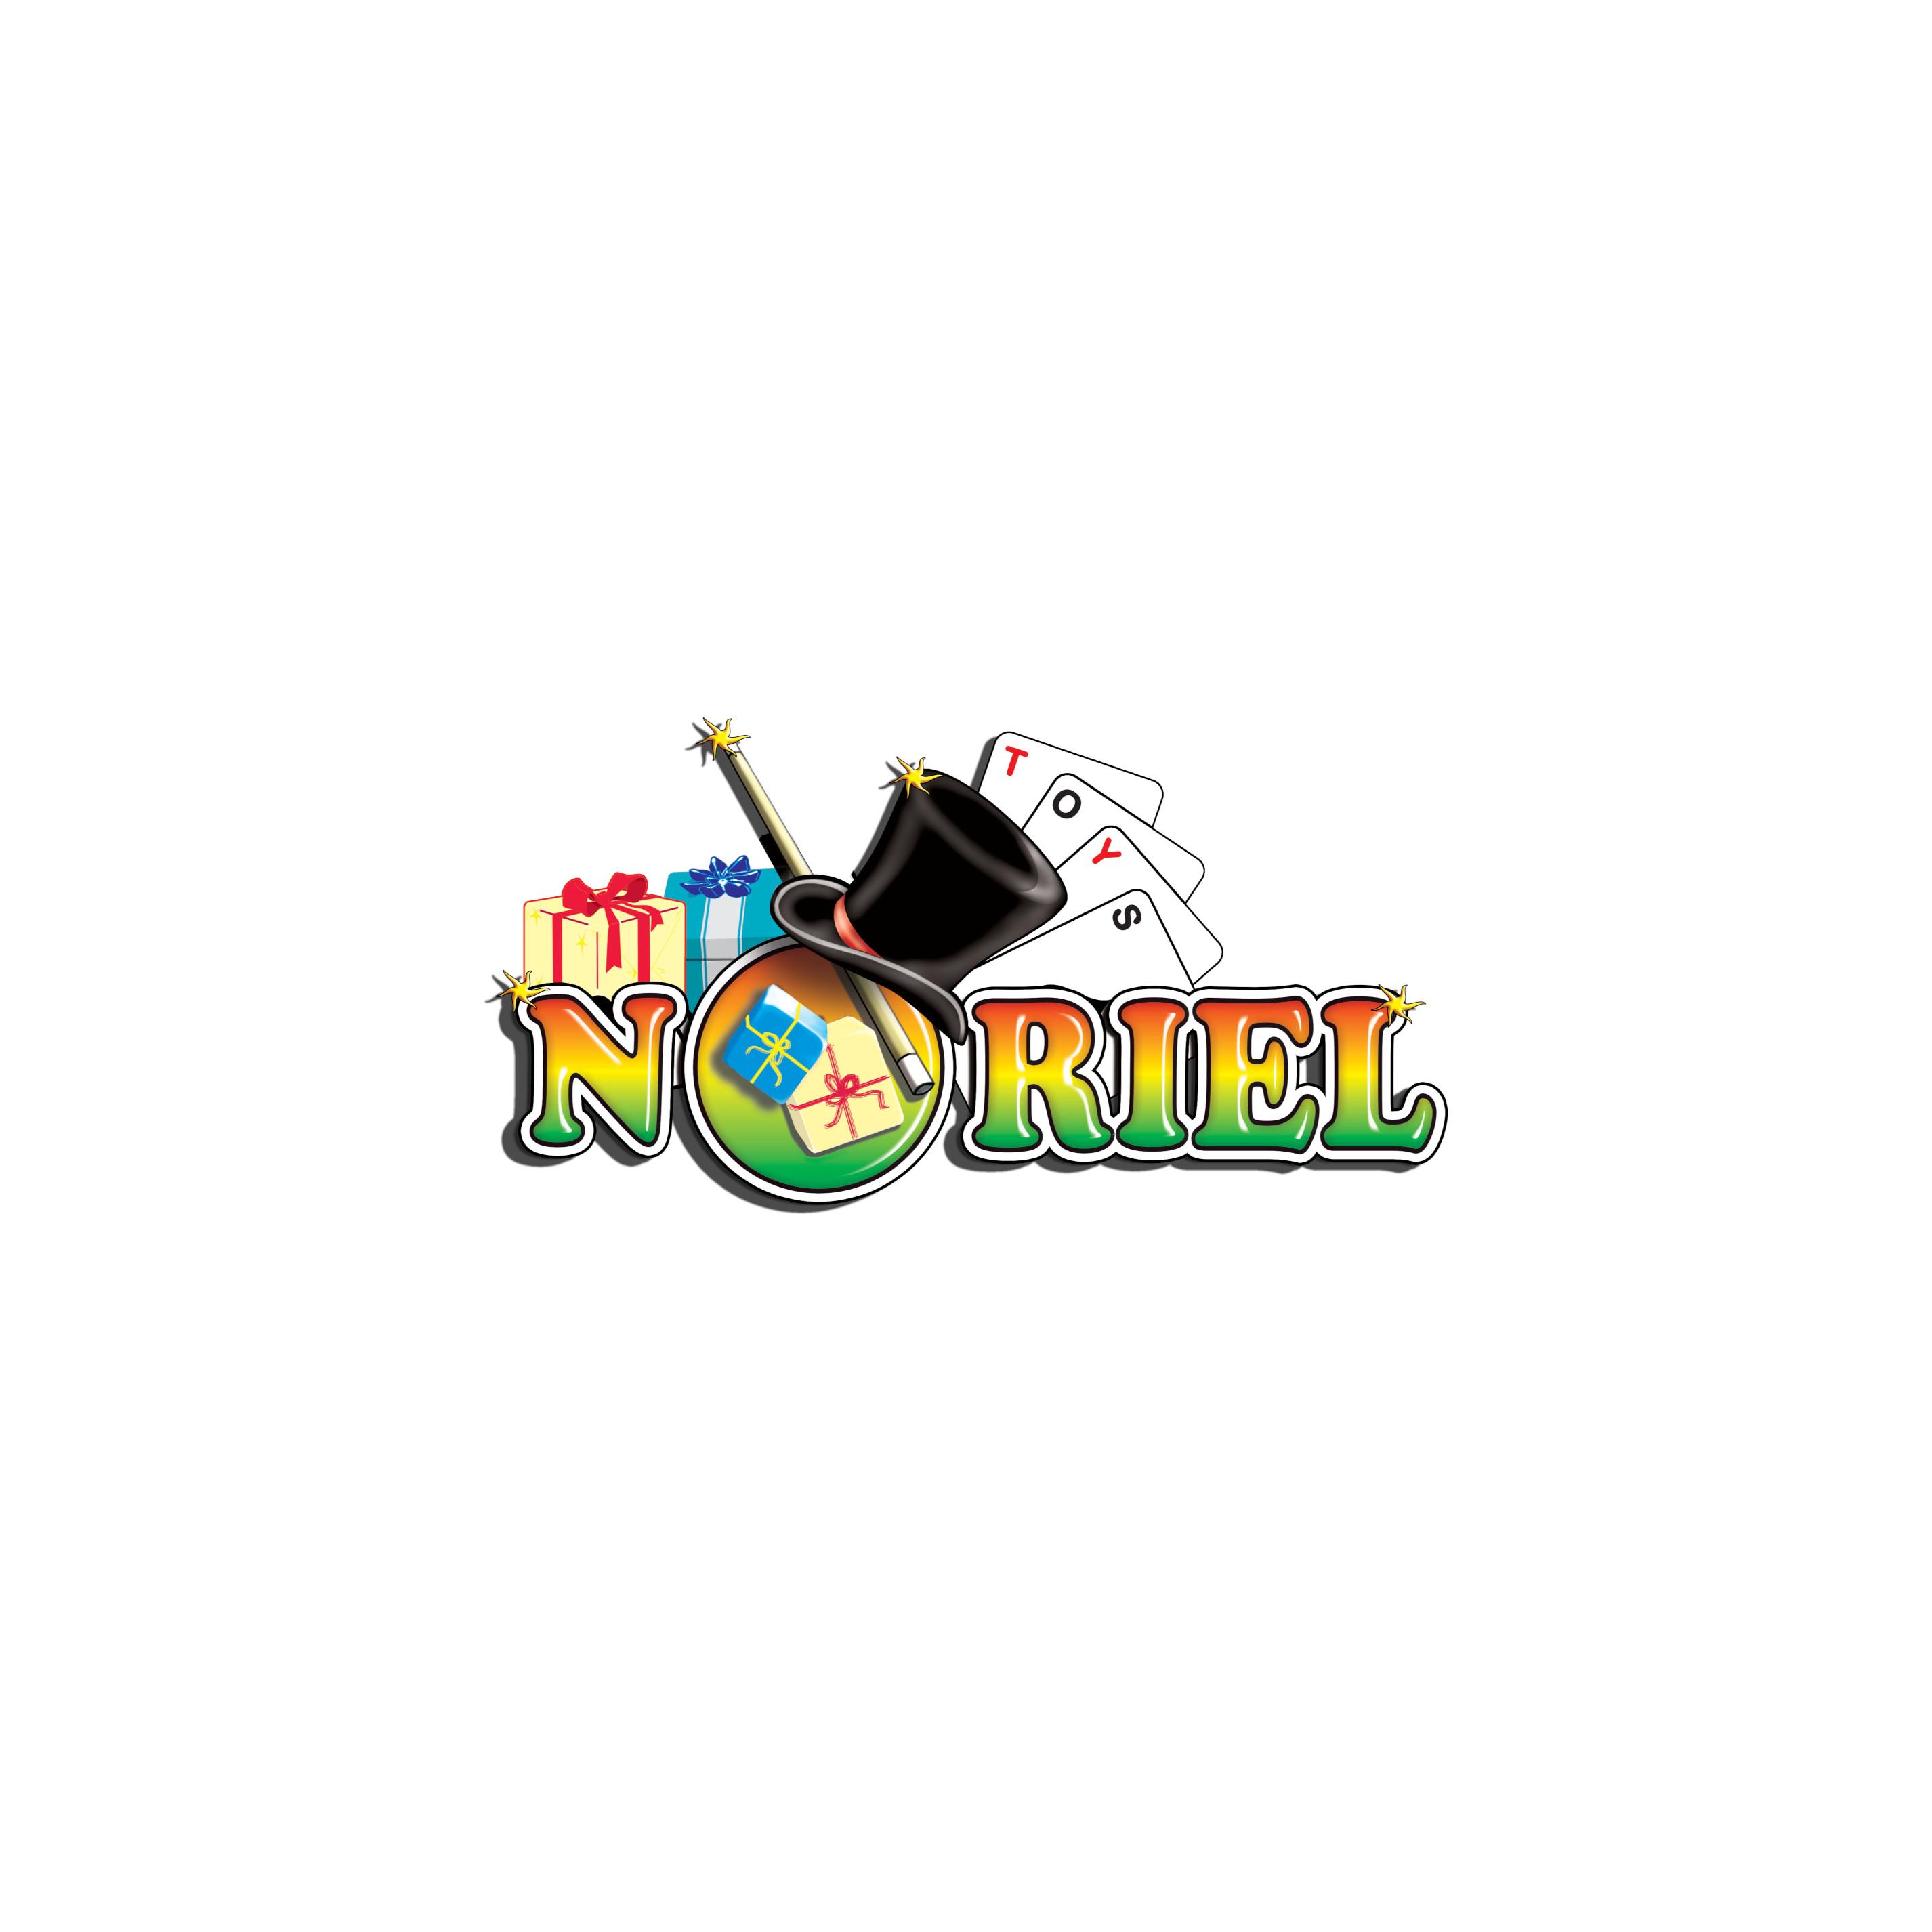 20201084_001 Ochelari de soare Disney Mickey Mouse